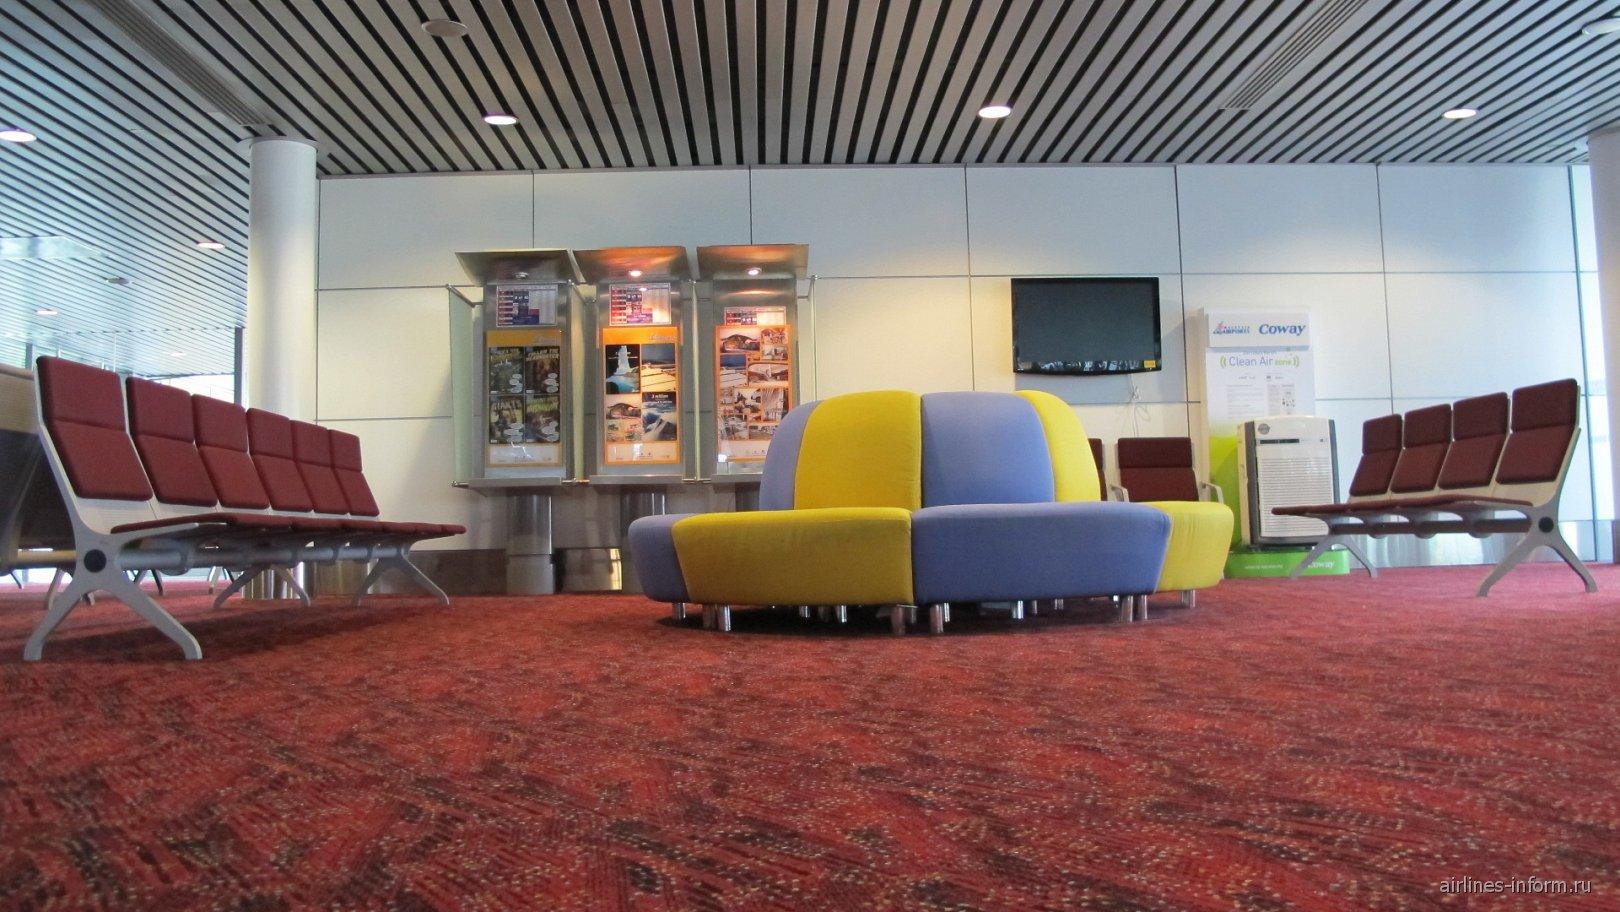 Зал ожидания перед выходом на посадку в аэропорту Куала-Лумпур